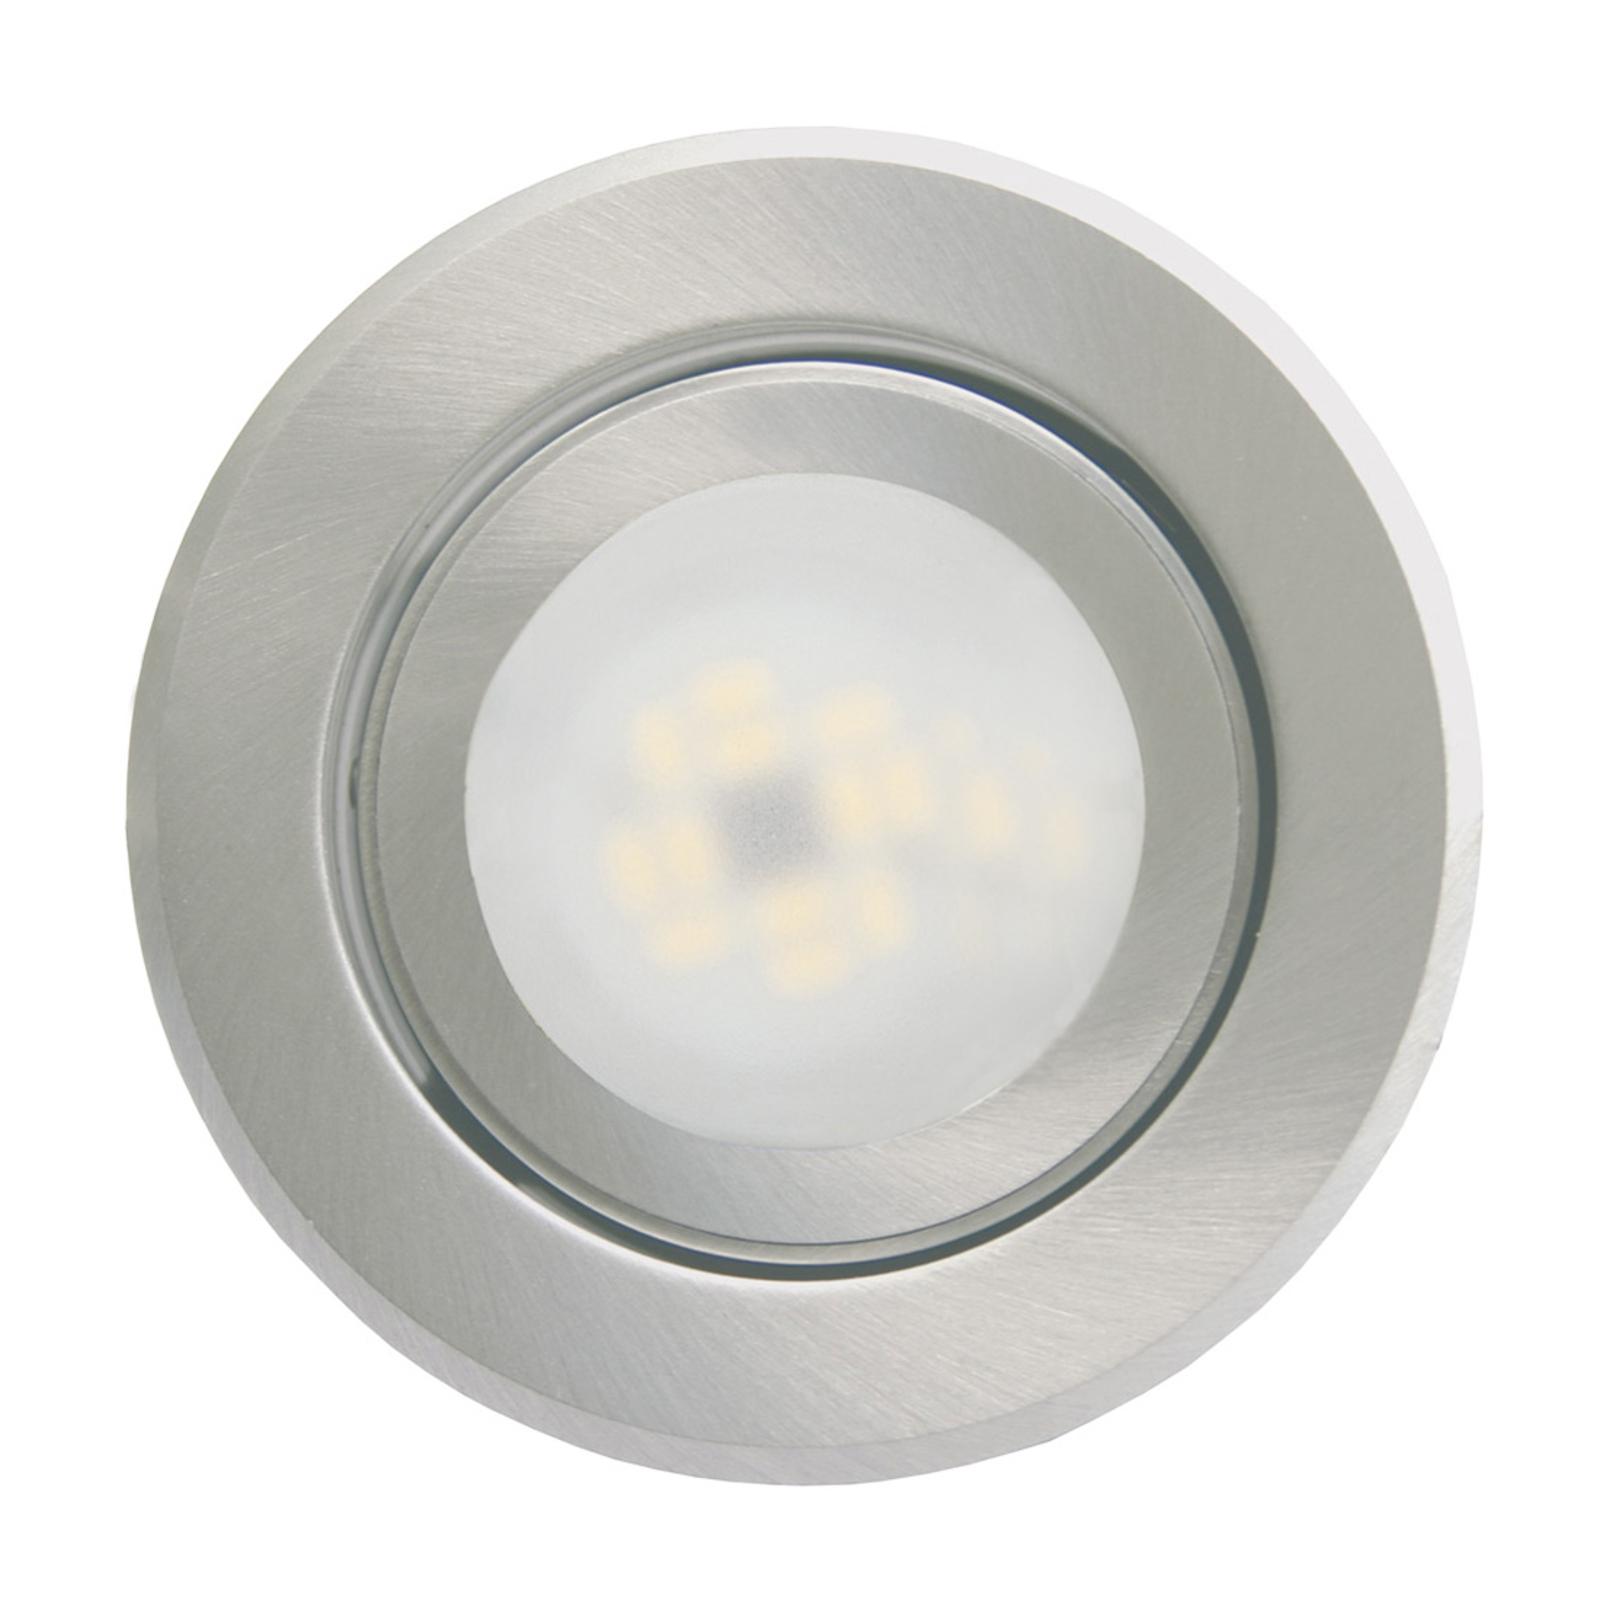 Lampe encastrable Joanie LED, aluminium brossé